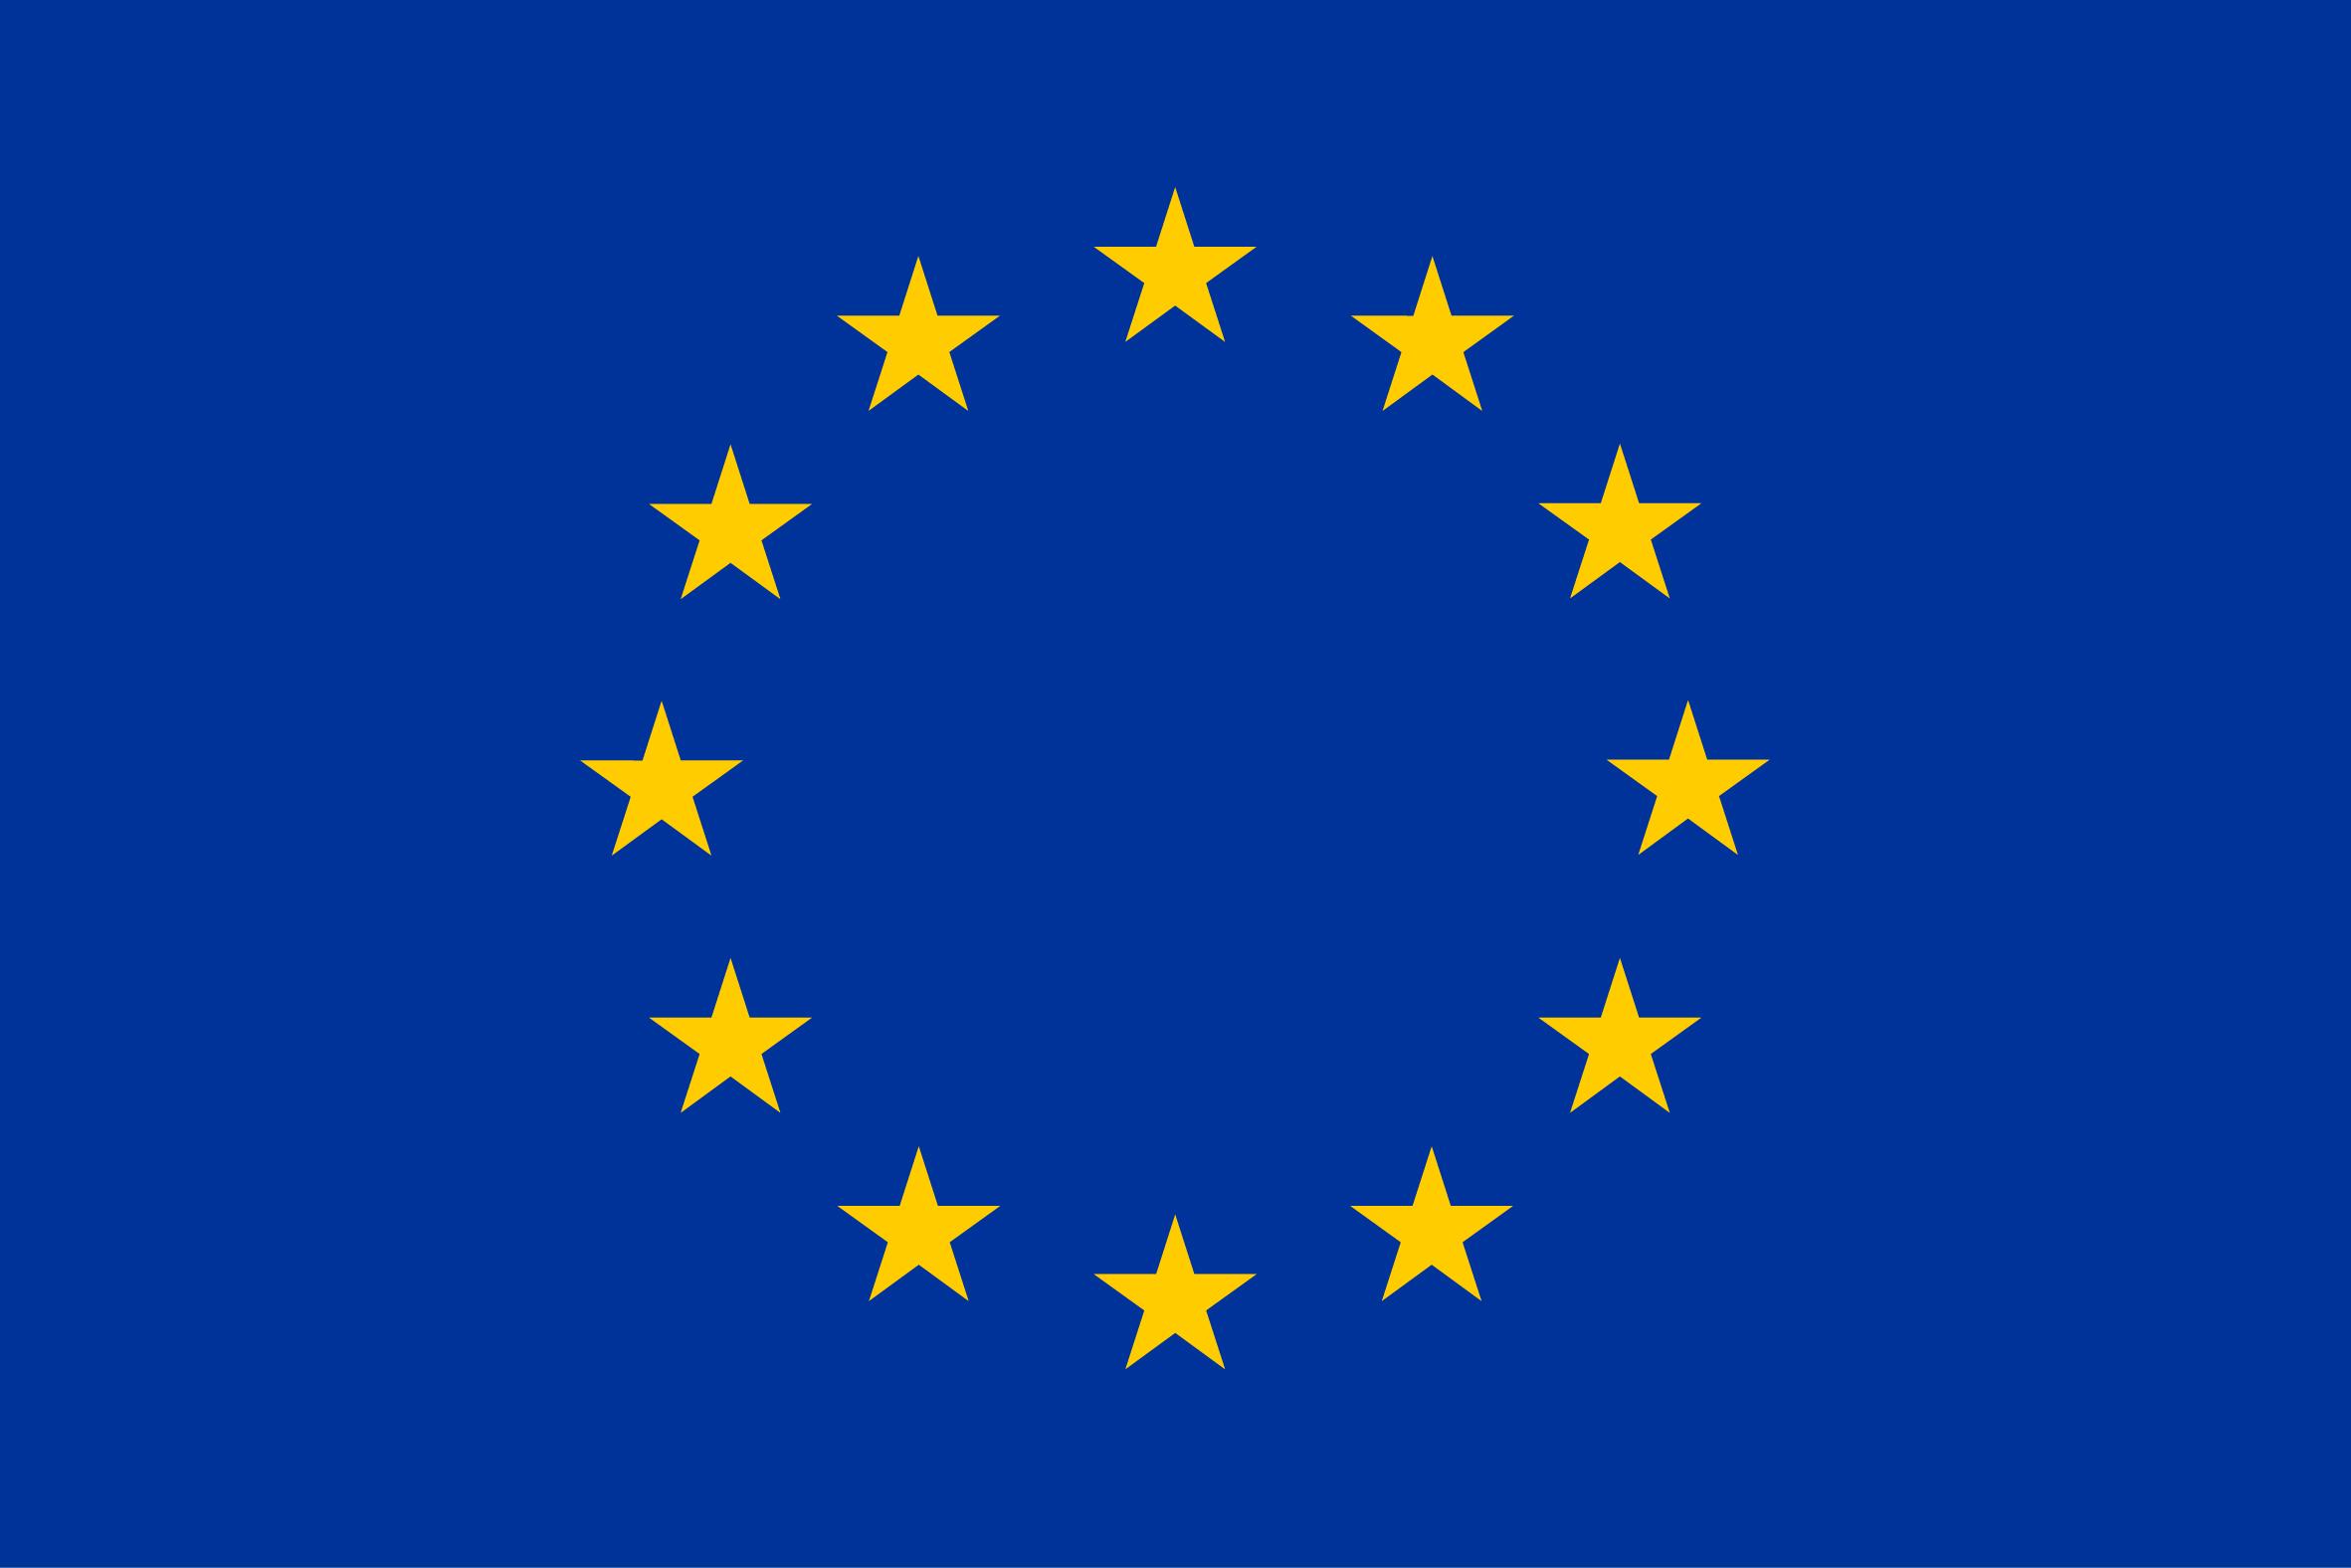 Bandera%20Union%20Europea.jpg